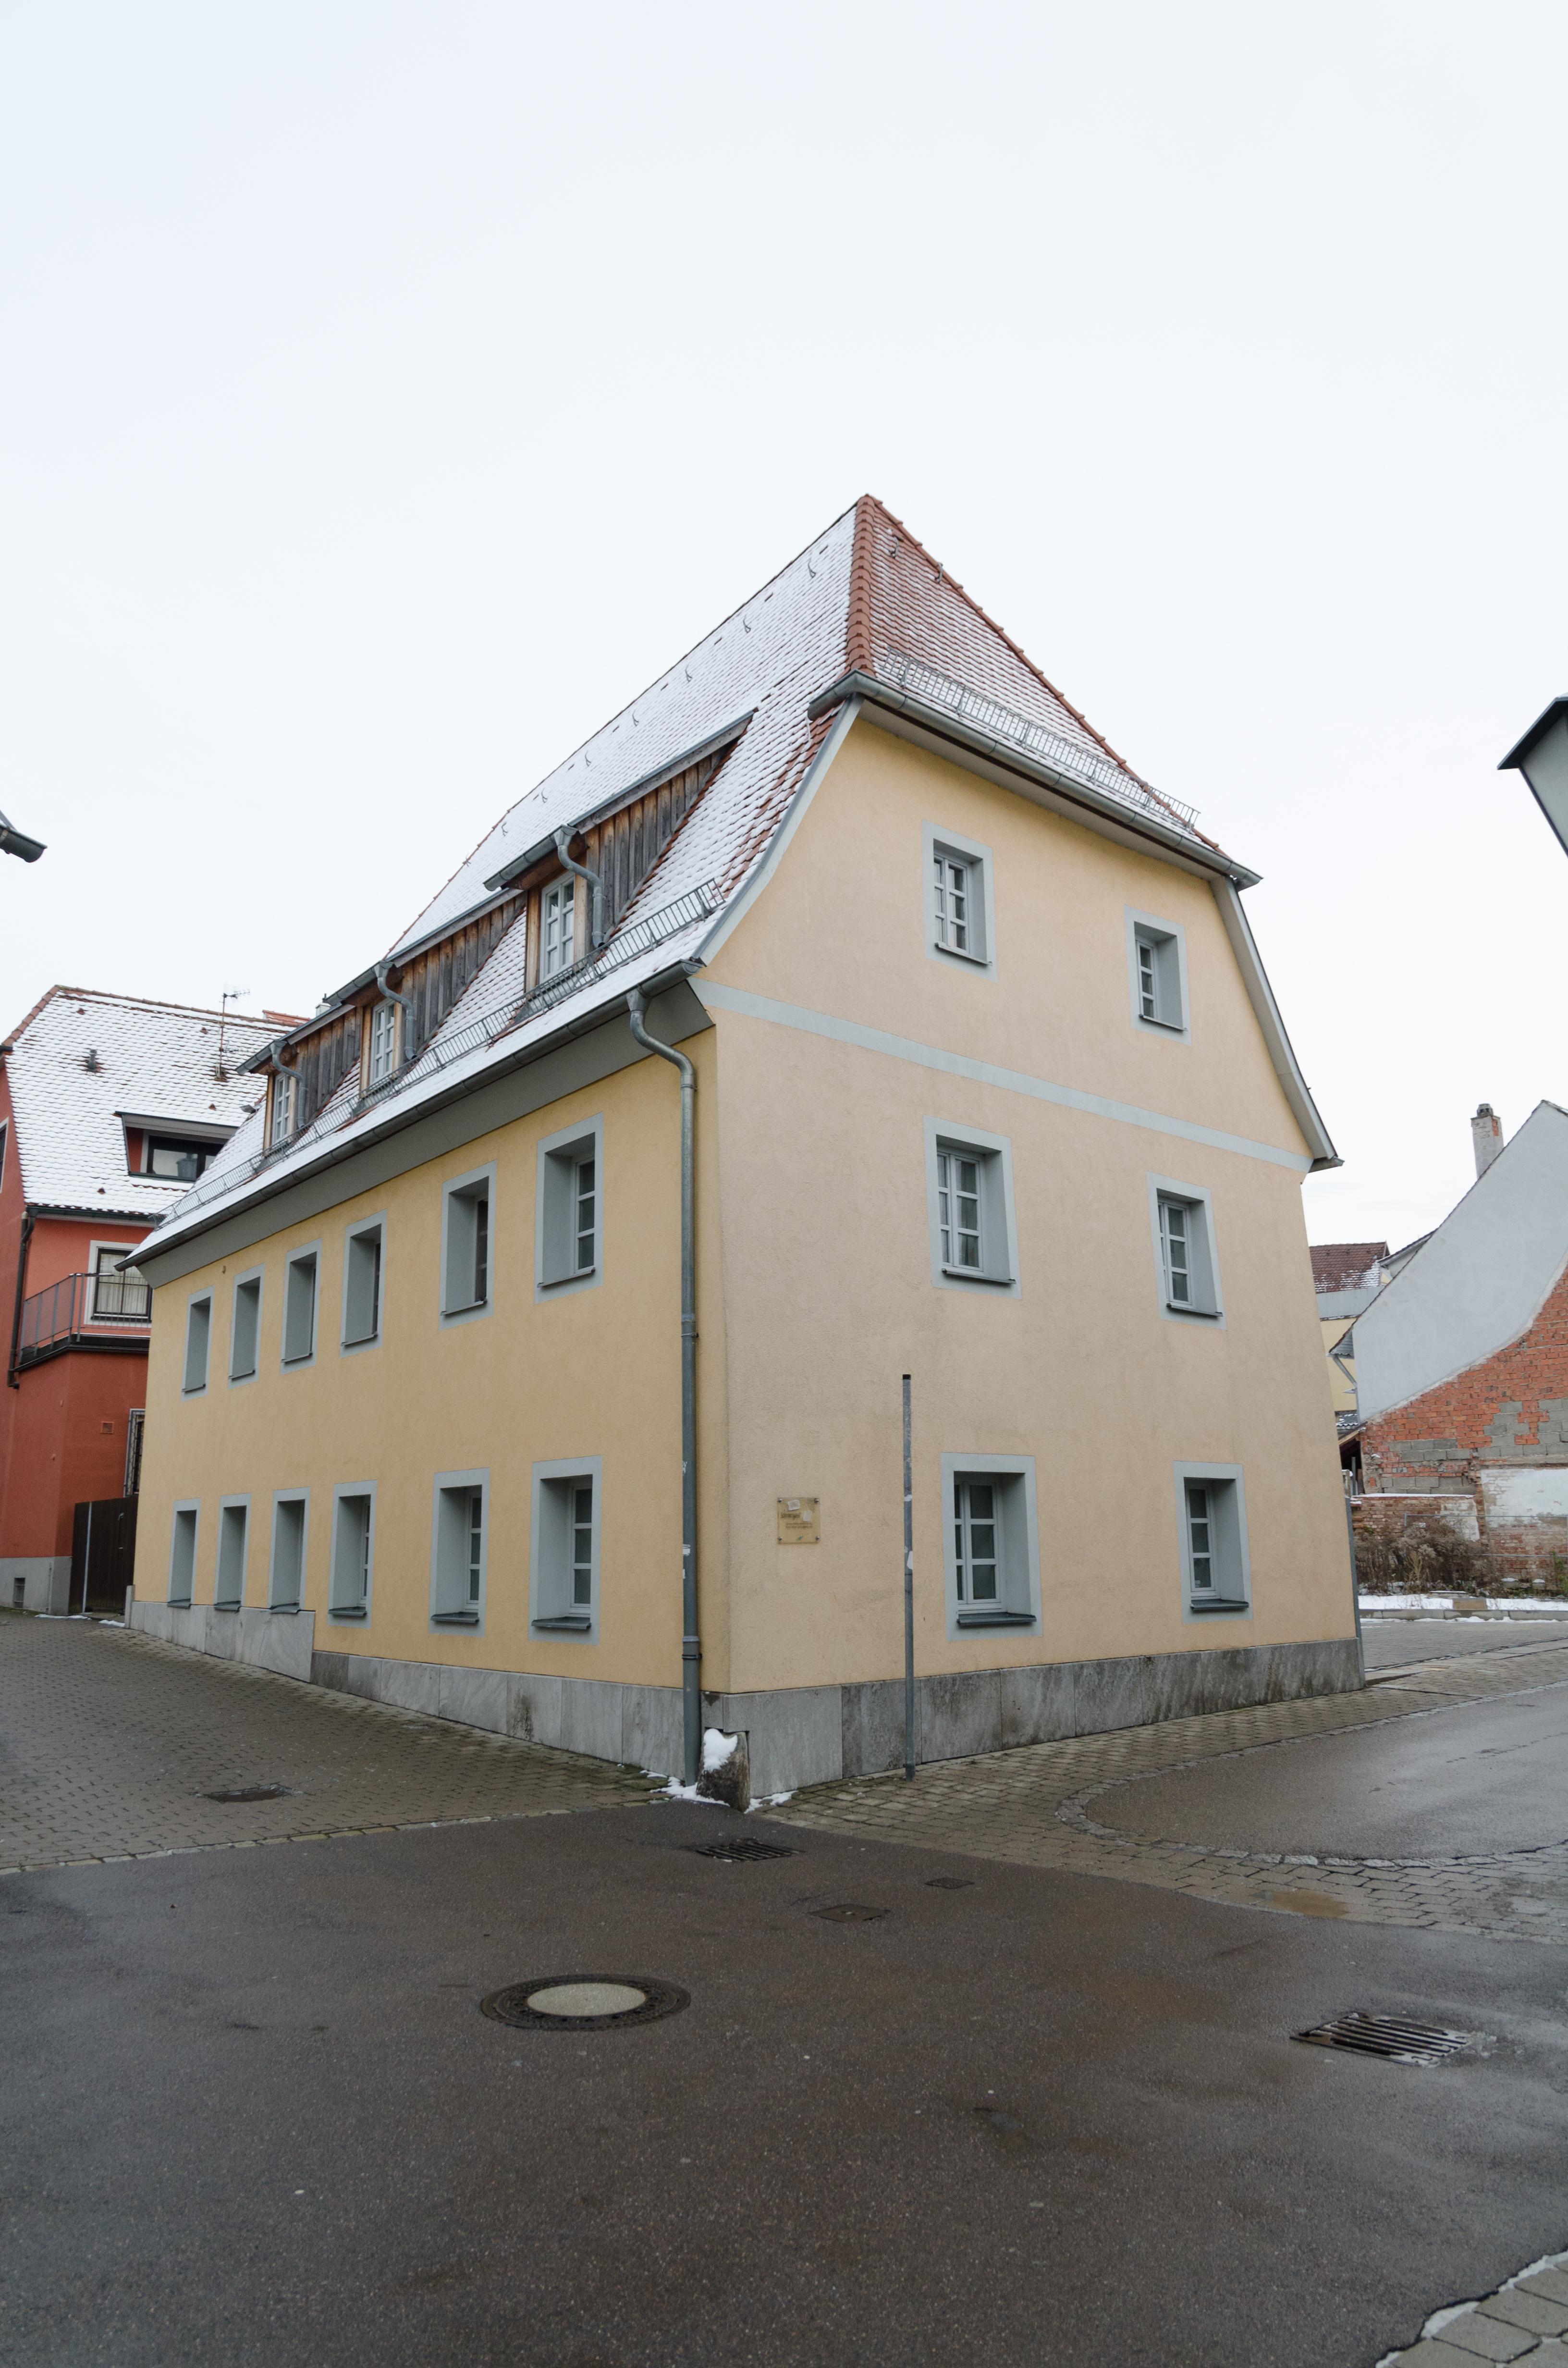 single bad windsheim Grevenbroich